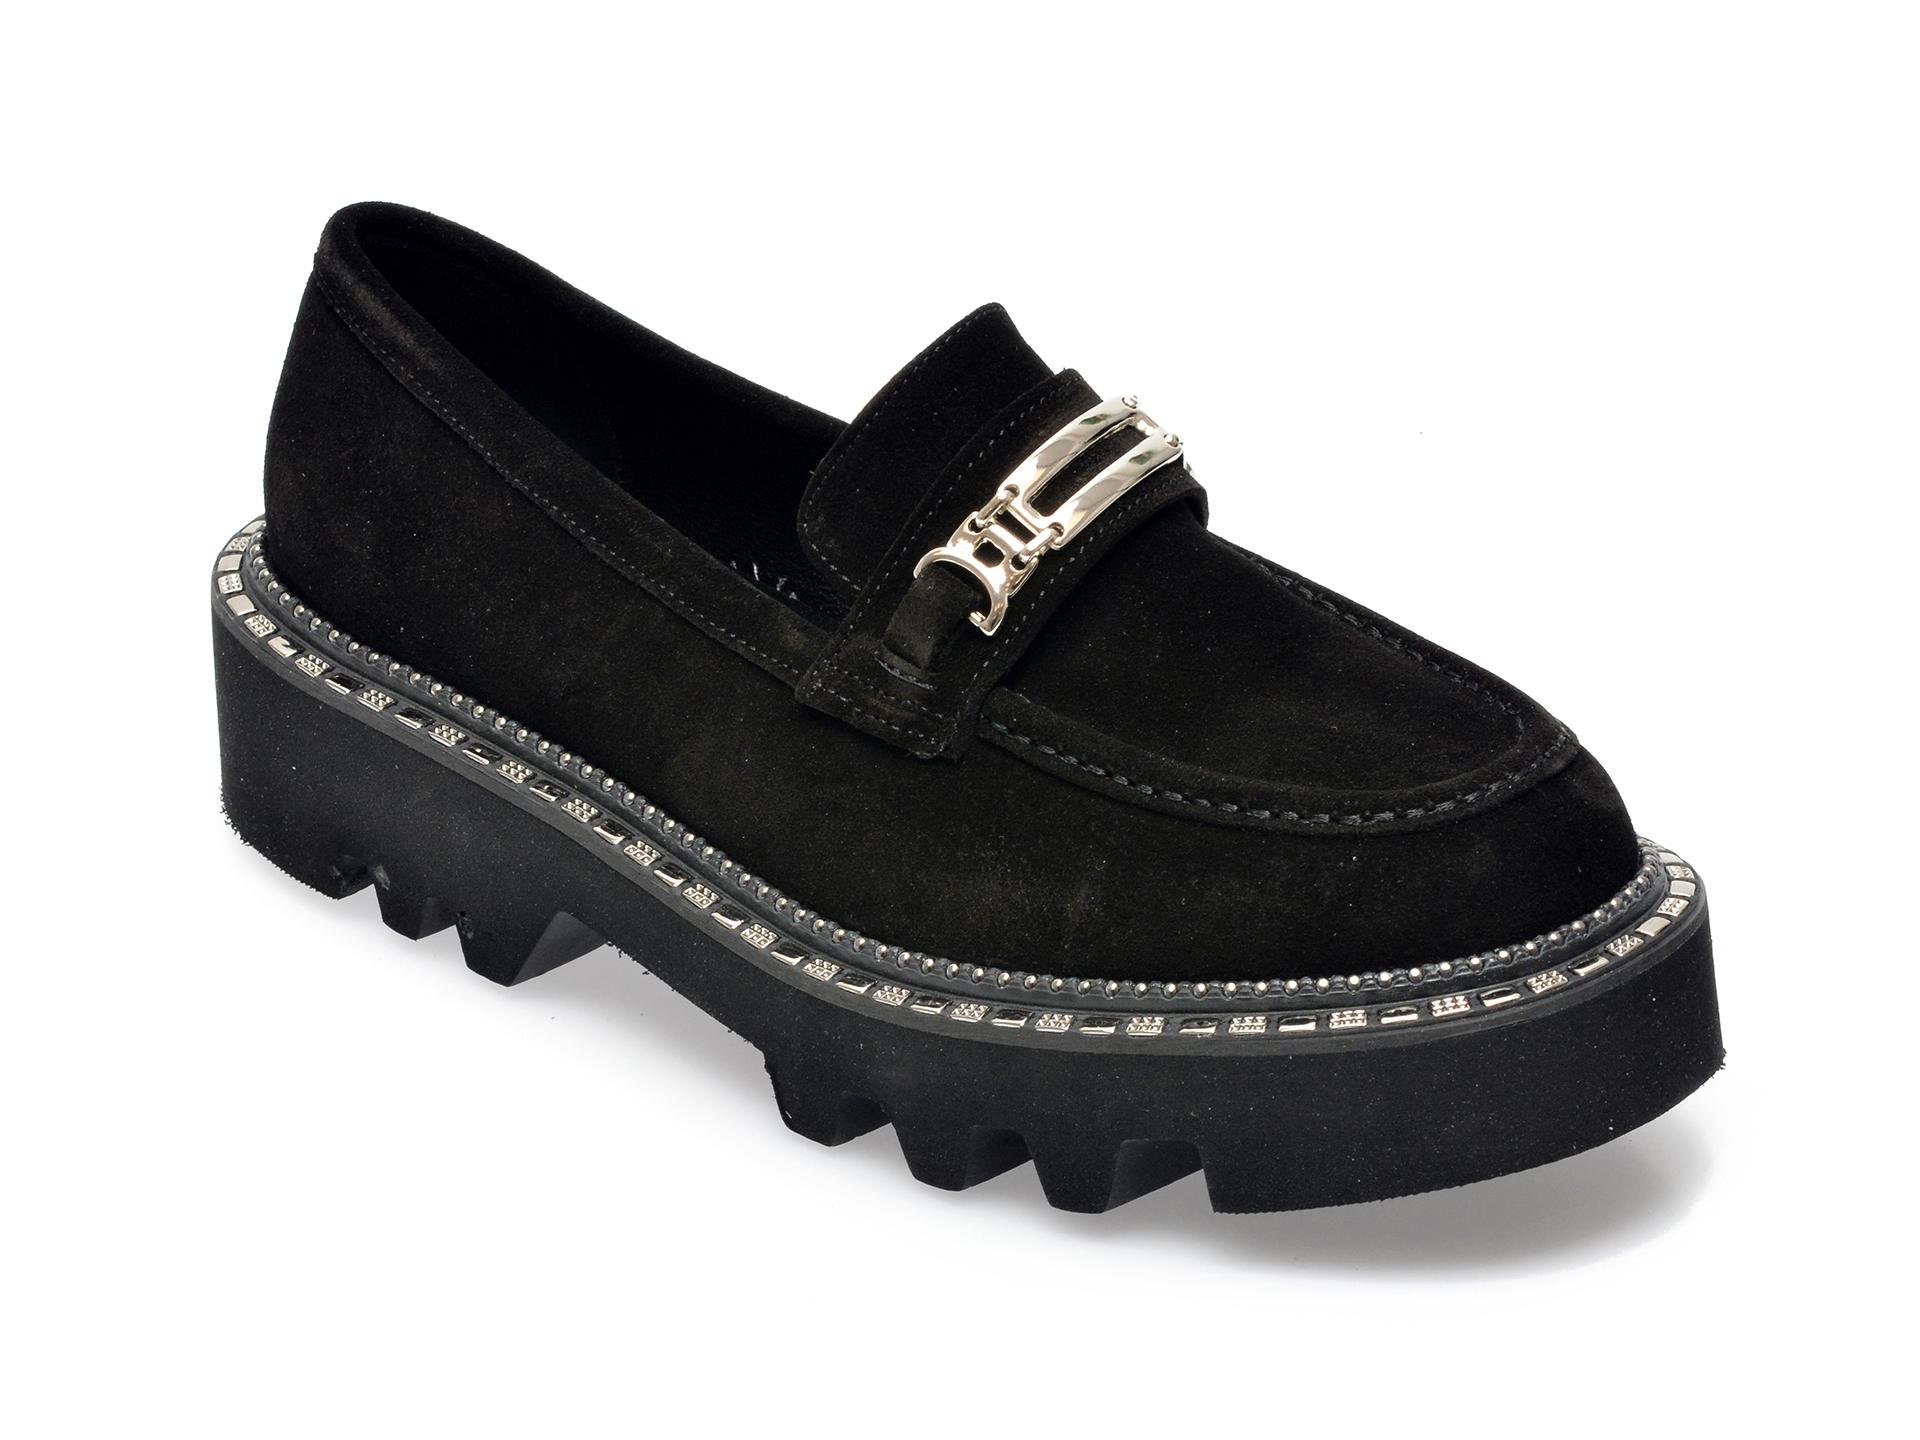 Pantofi EPICA negri, 21996, din piele intoarsa imagine otter.ro 2021